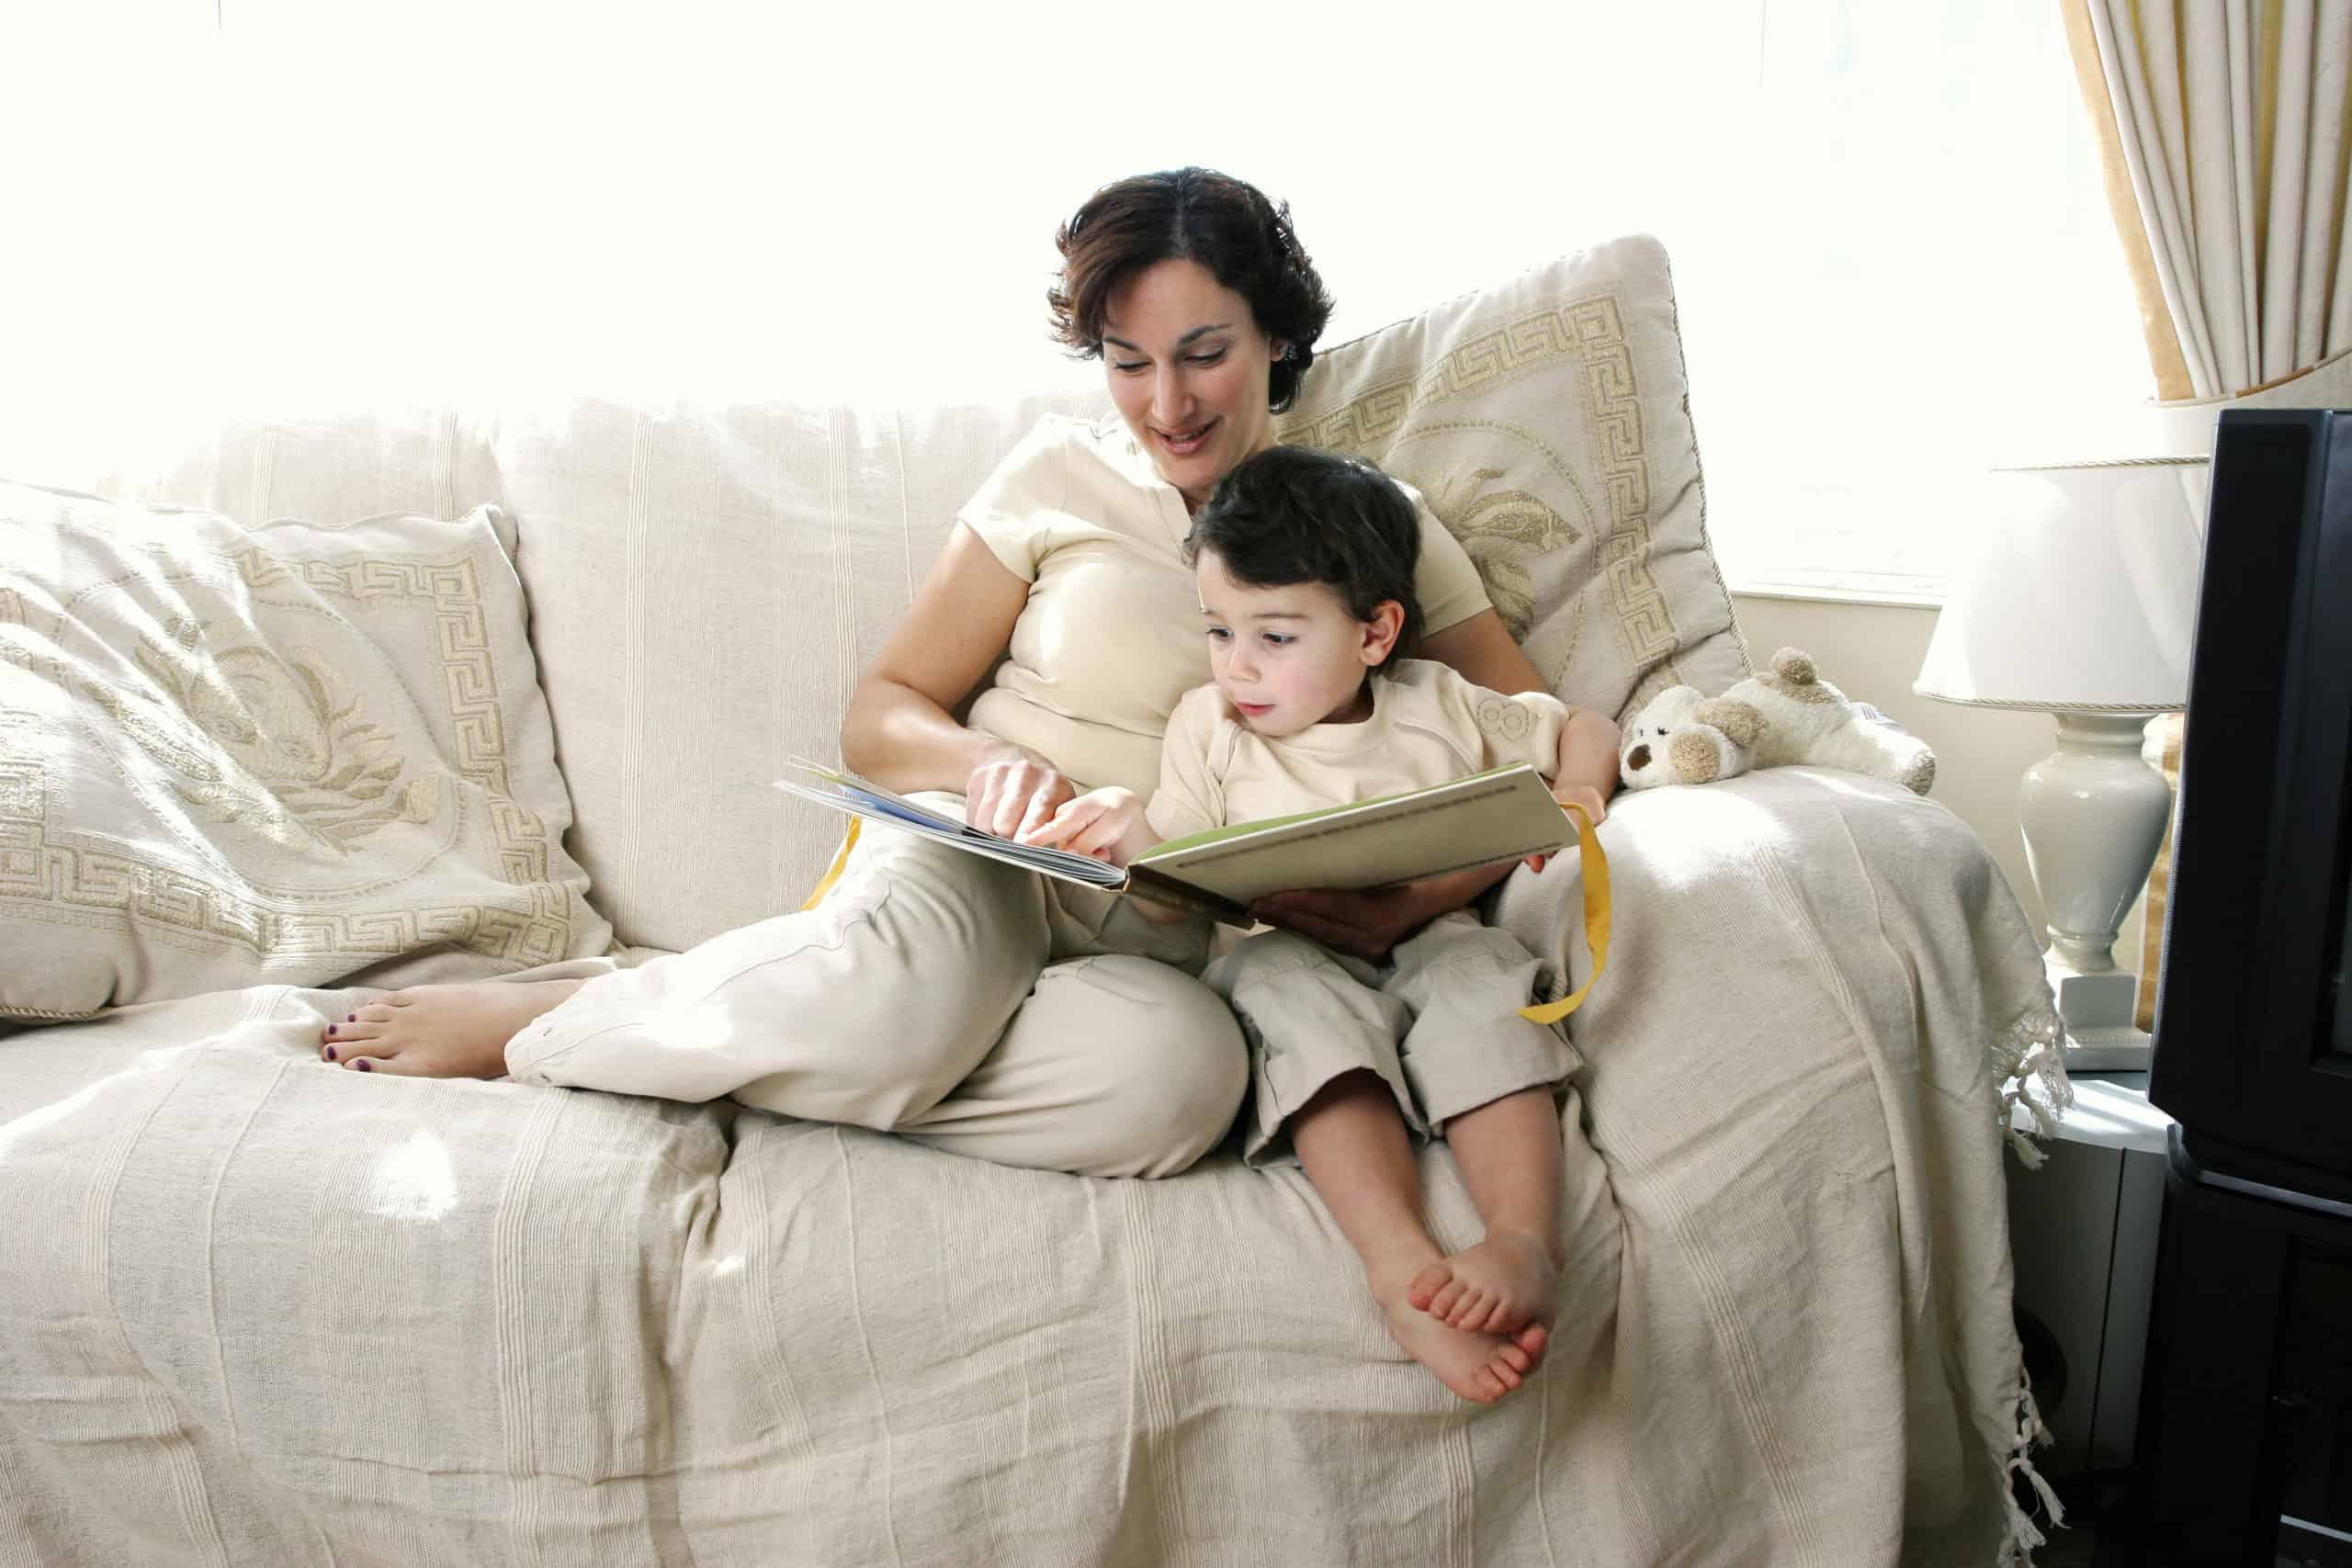 Does parenting style affect academic achievement?